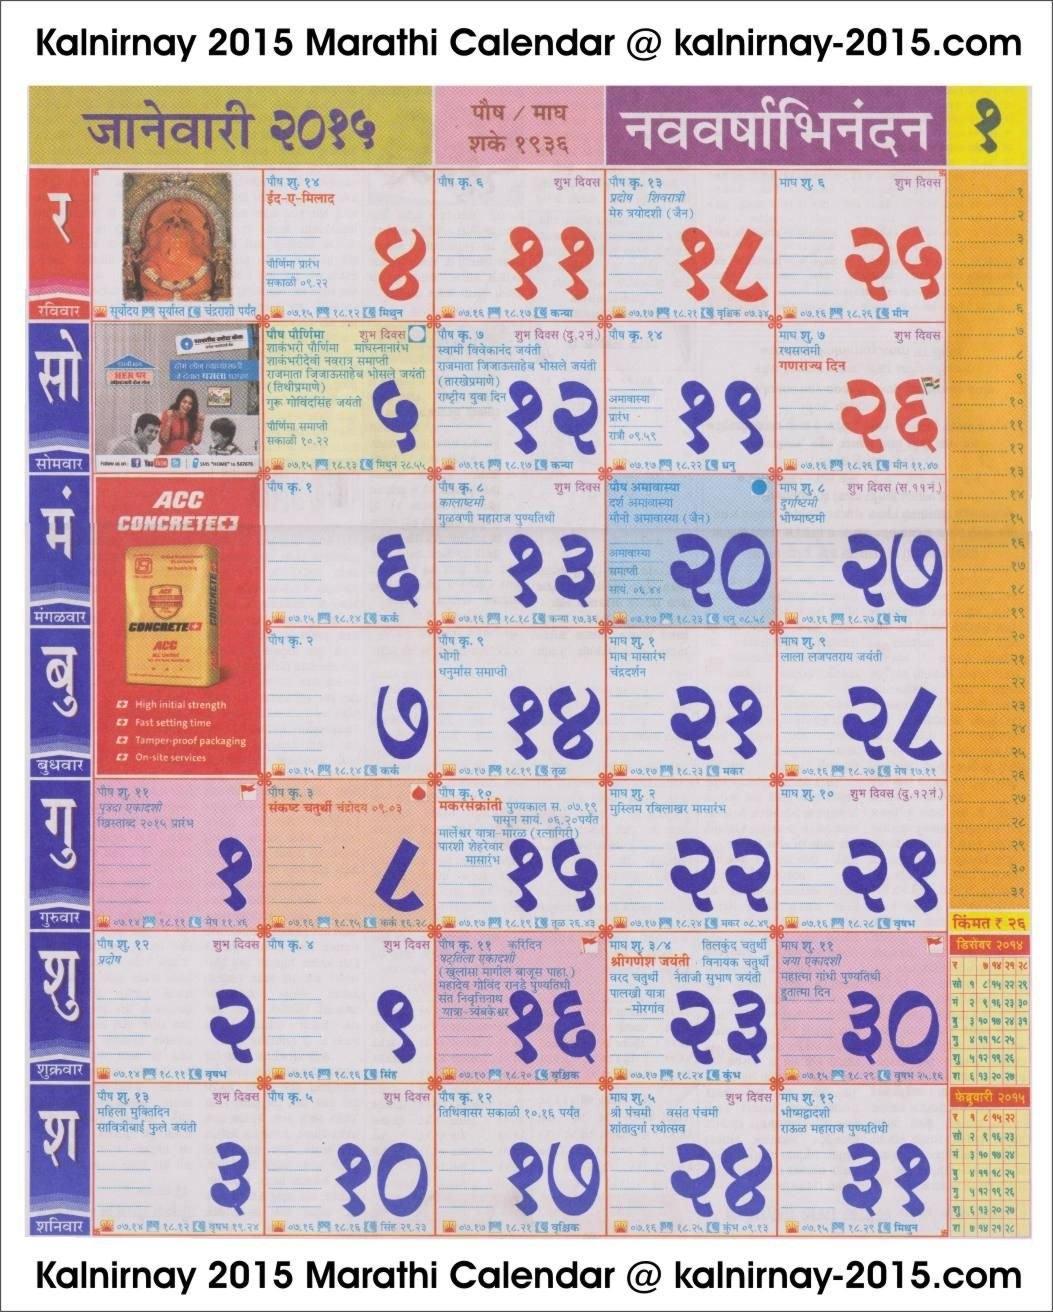 January 2015 Marathi Kalnirnay Calendar | 2015 Kalnirnay Marathi Calendar 2019 Kalnirnay March